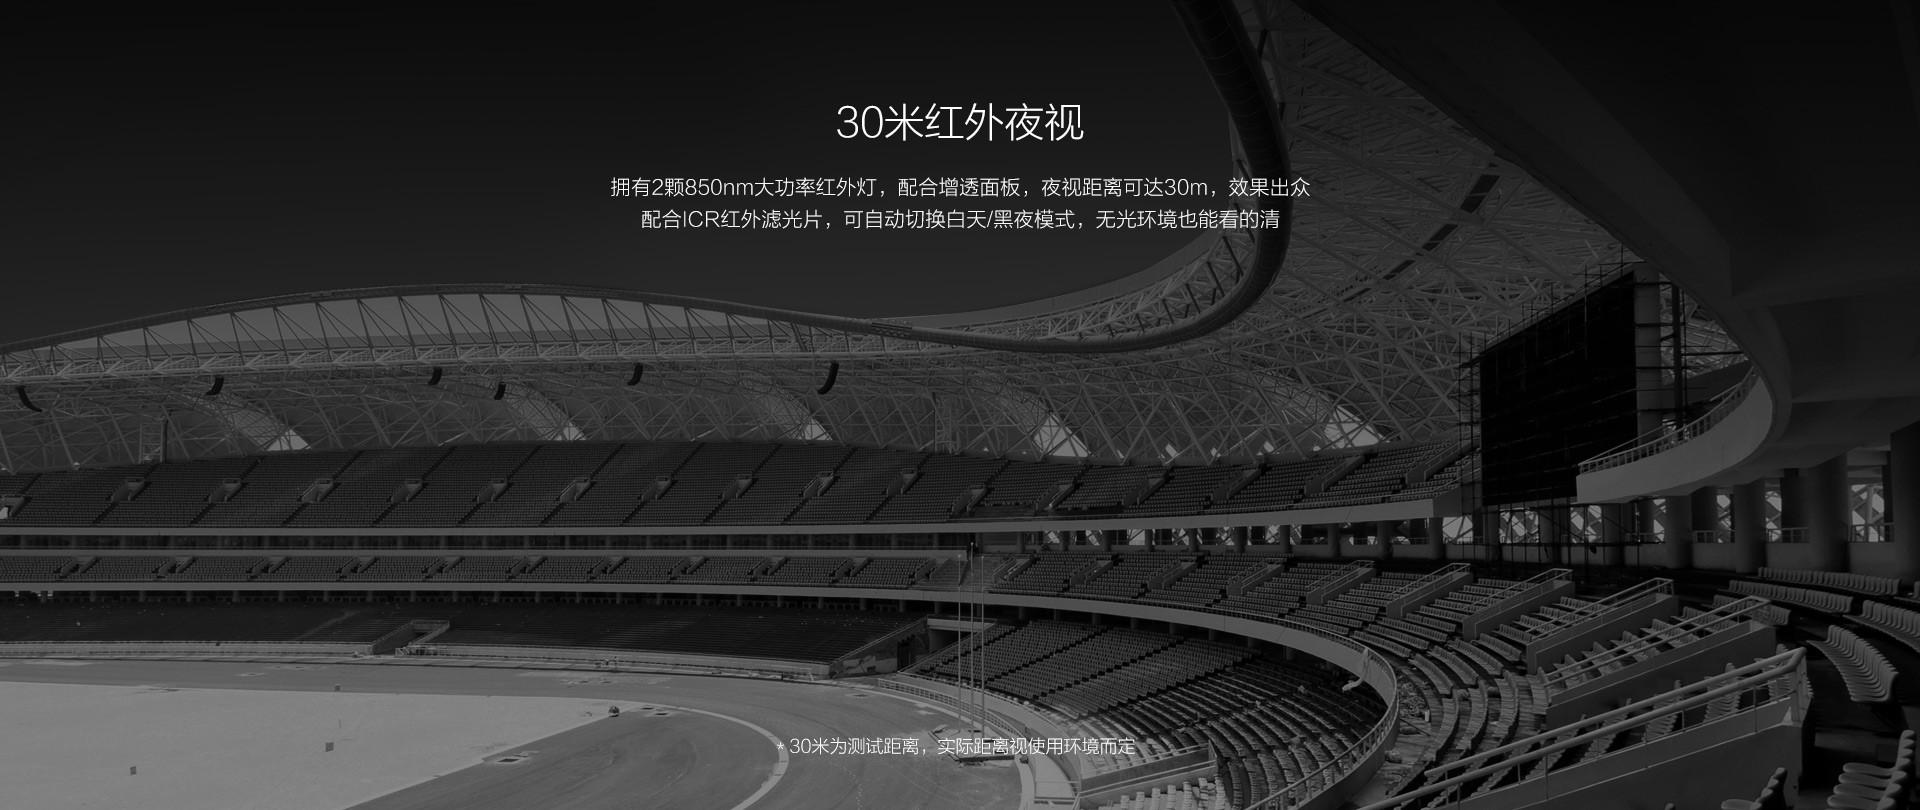 C4-web.jpg